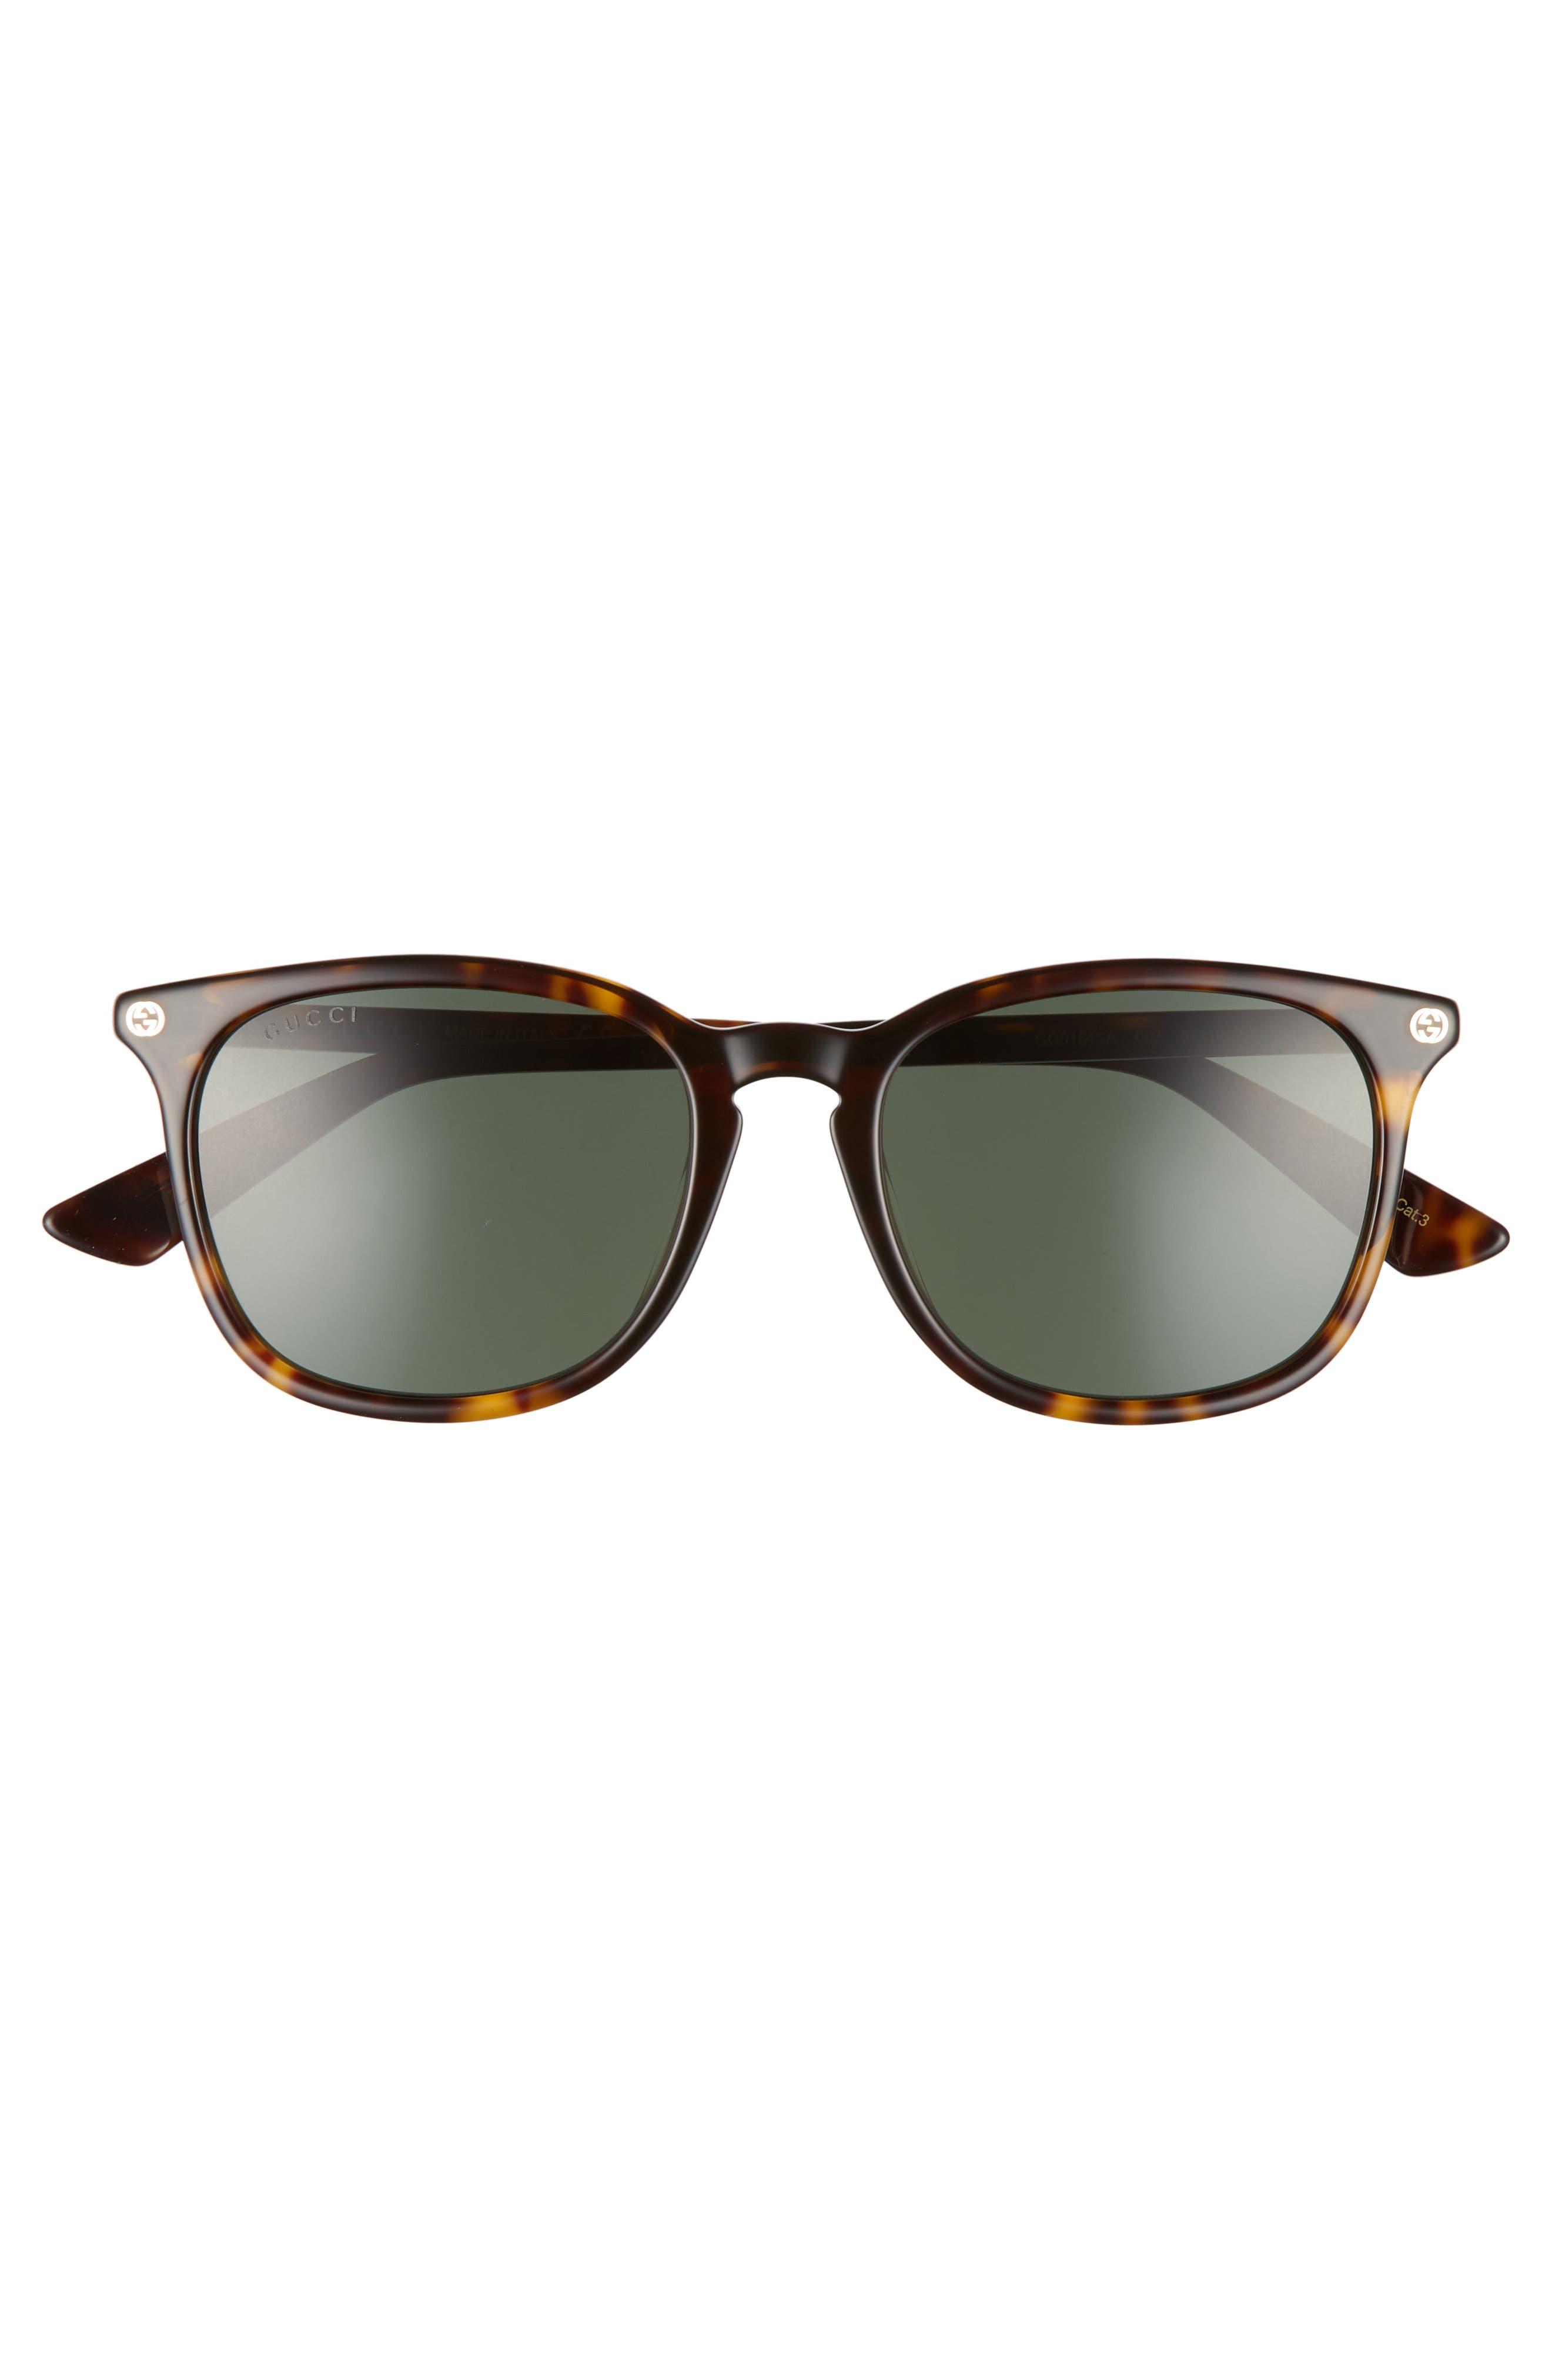 3a094ffe94 Men s Gucci Sunglasses   Eyeglasses